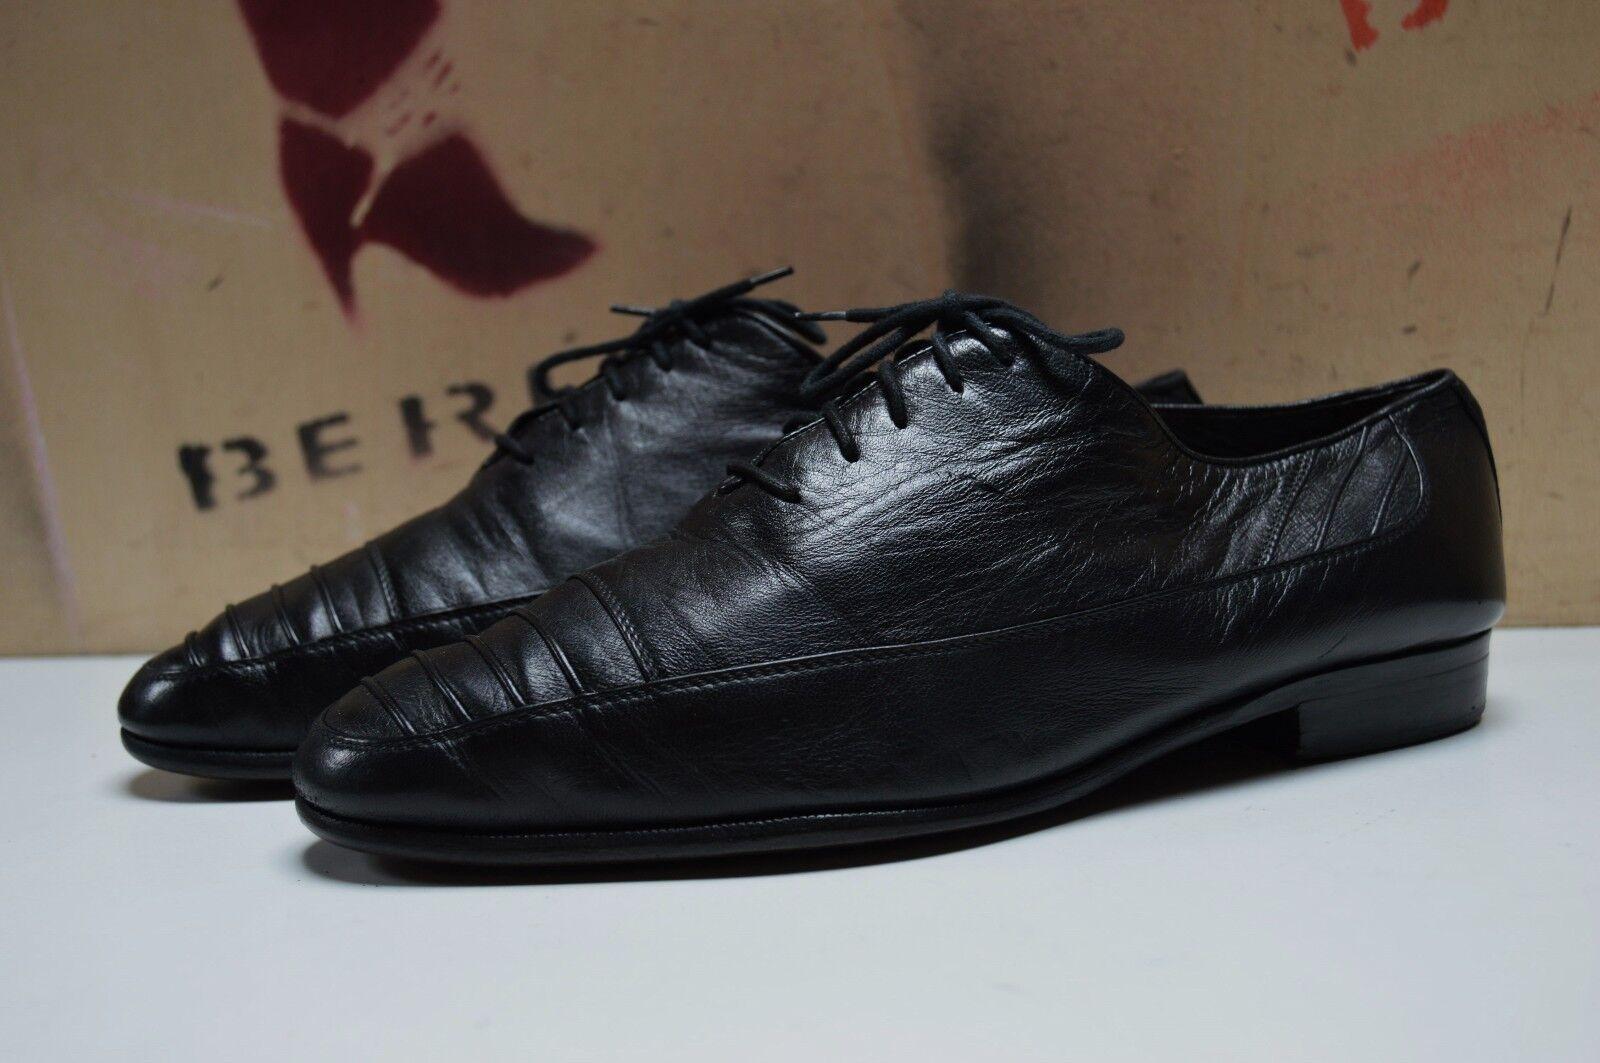 Aldo Bruè Herren Schnürschuhe Halbschuhe made italy True Vintage schwarz Schuhe